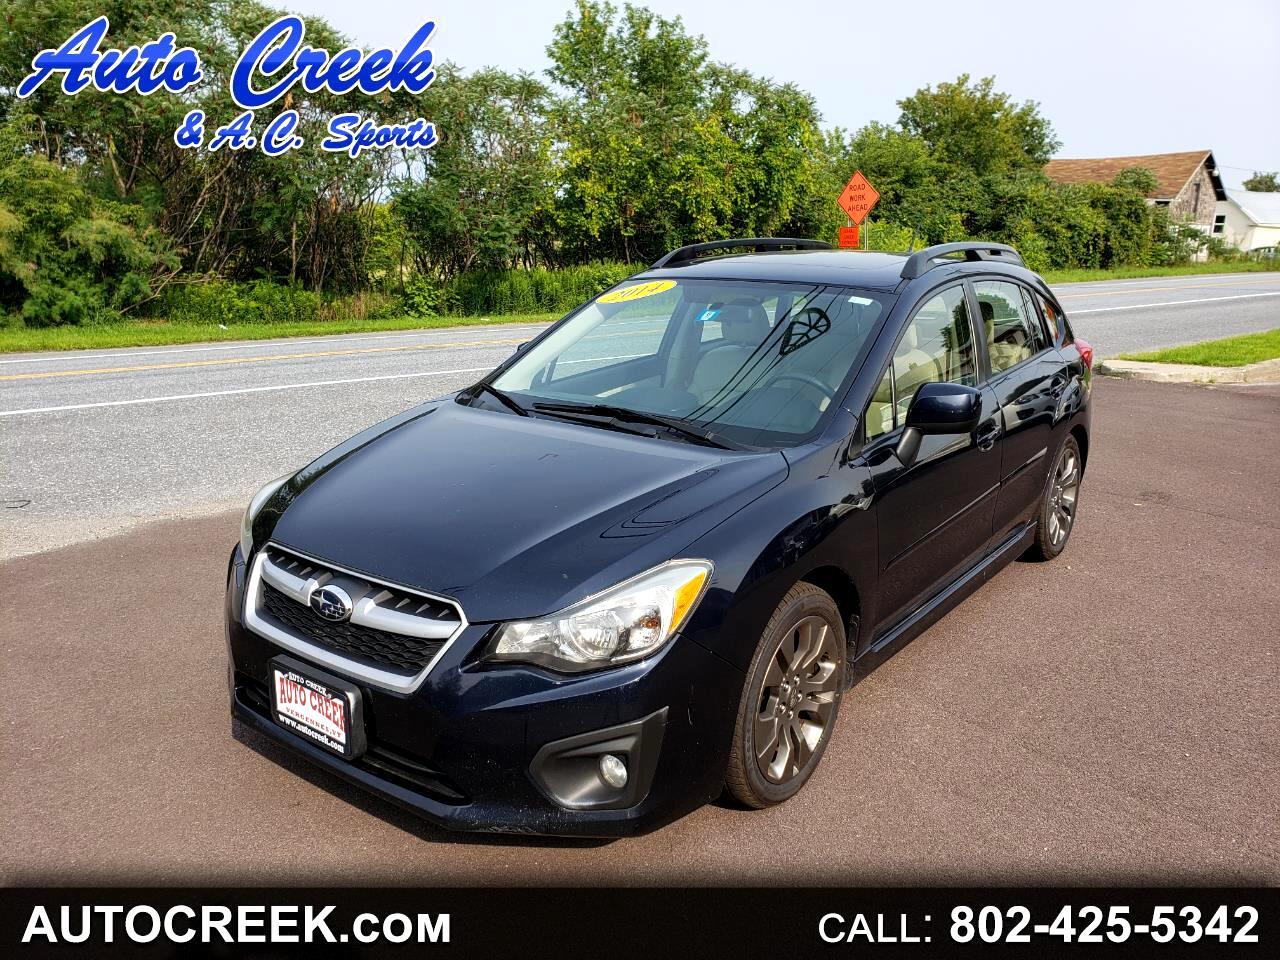 Subaru Impreza Sport 5-Door-Limited+S/R 2014